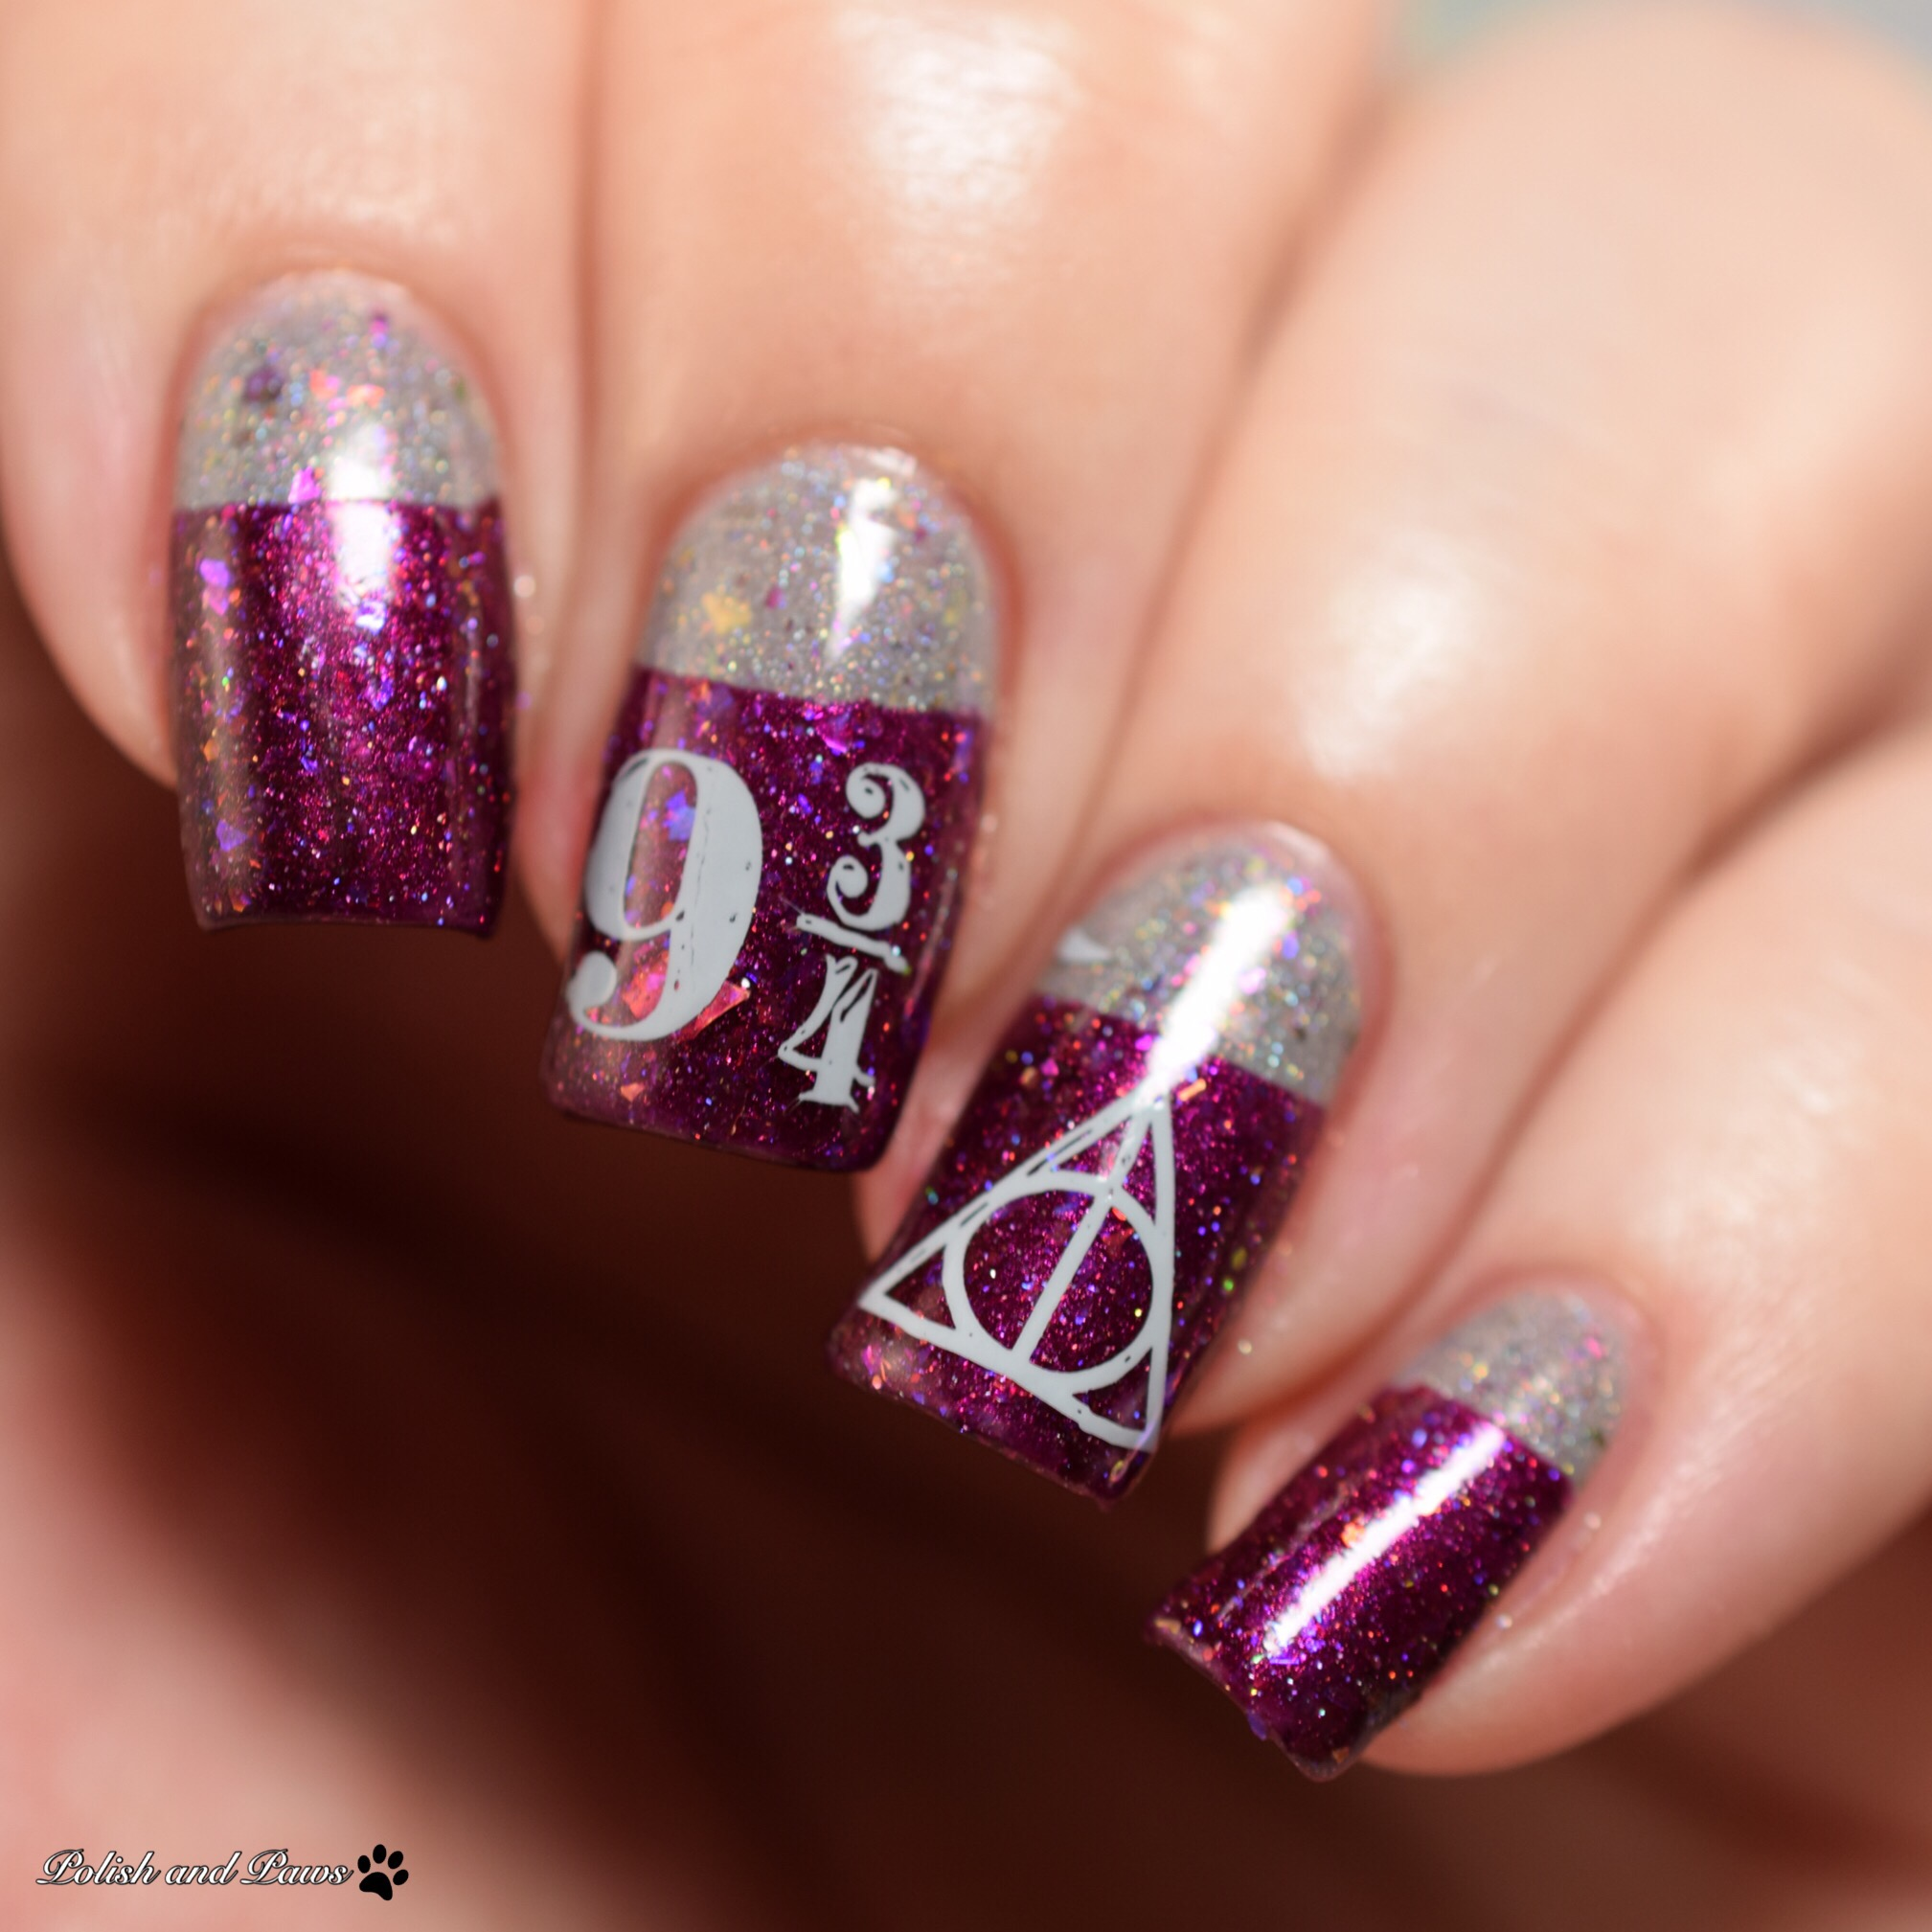 Glam Polish Iconic Duo Harry Potter Nail Art